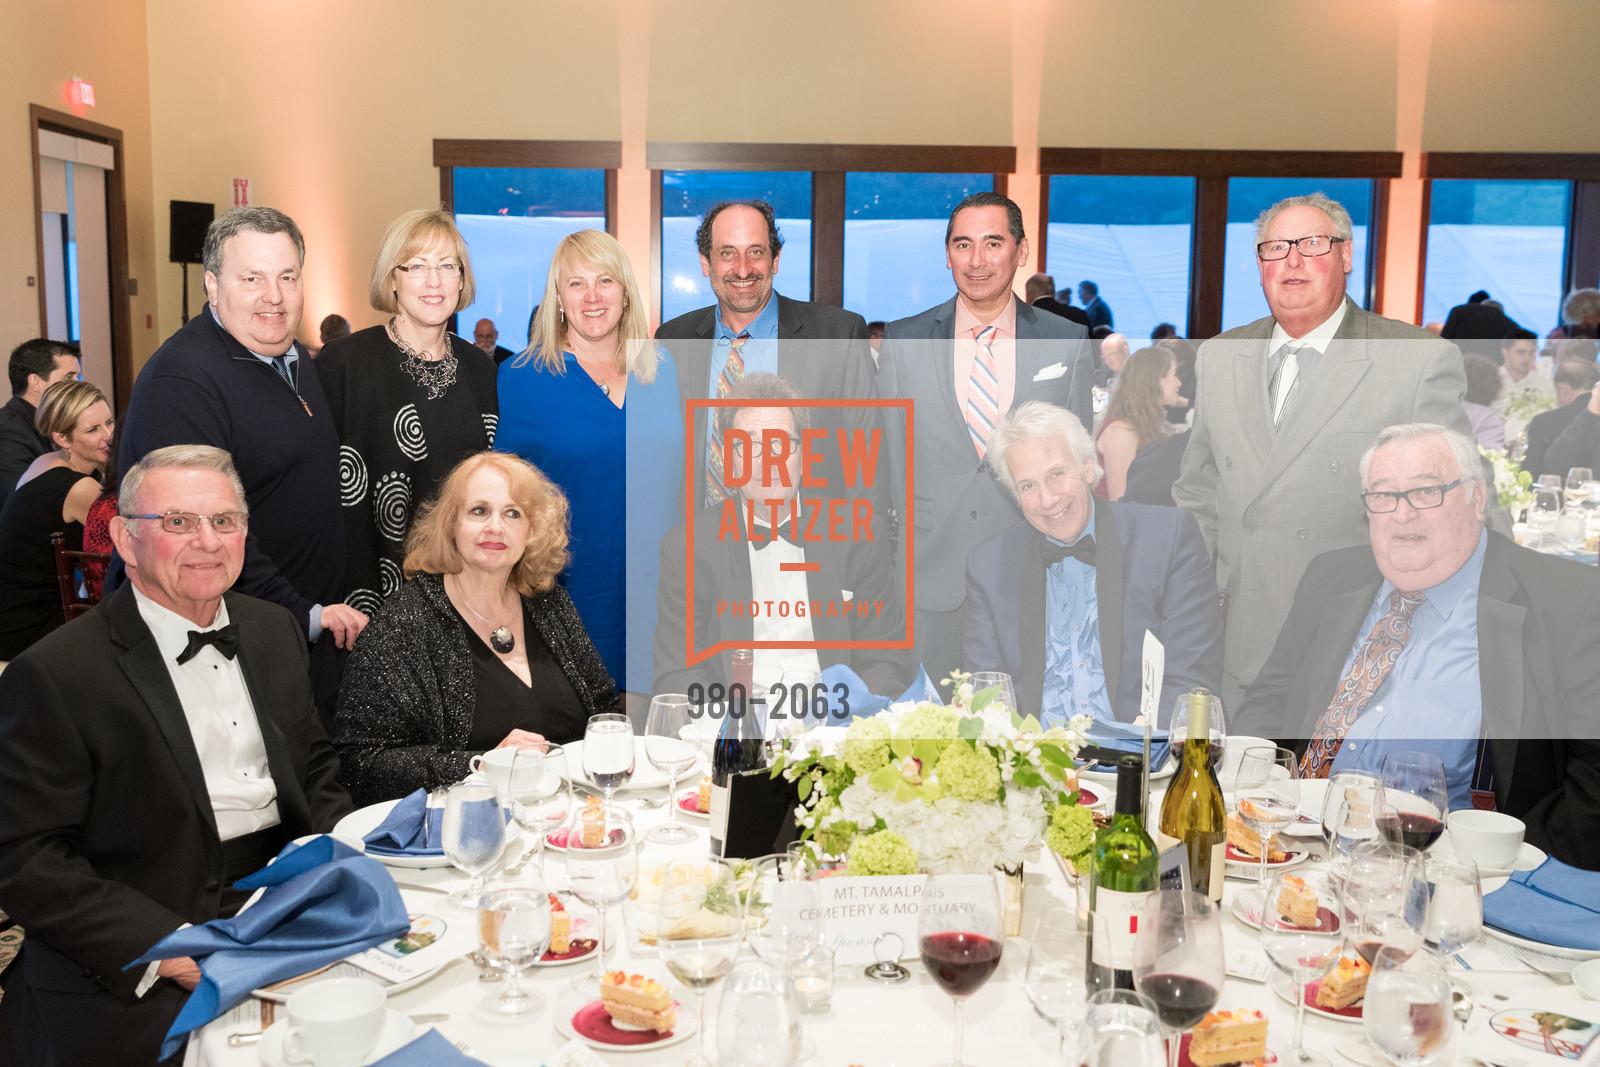 Robert Romano, Jill Romano, Huey Lewis, Jack Thornton, Bud E. Luv, Buck Kamphausen, Photo #980-2063